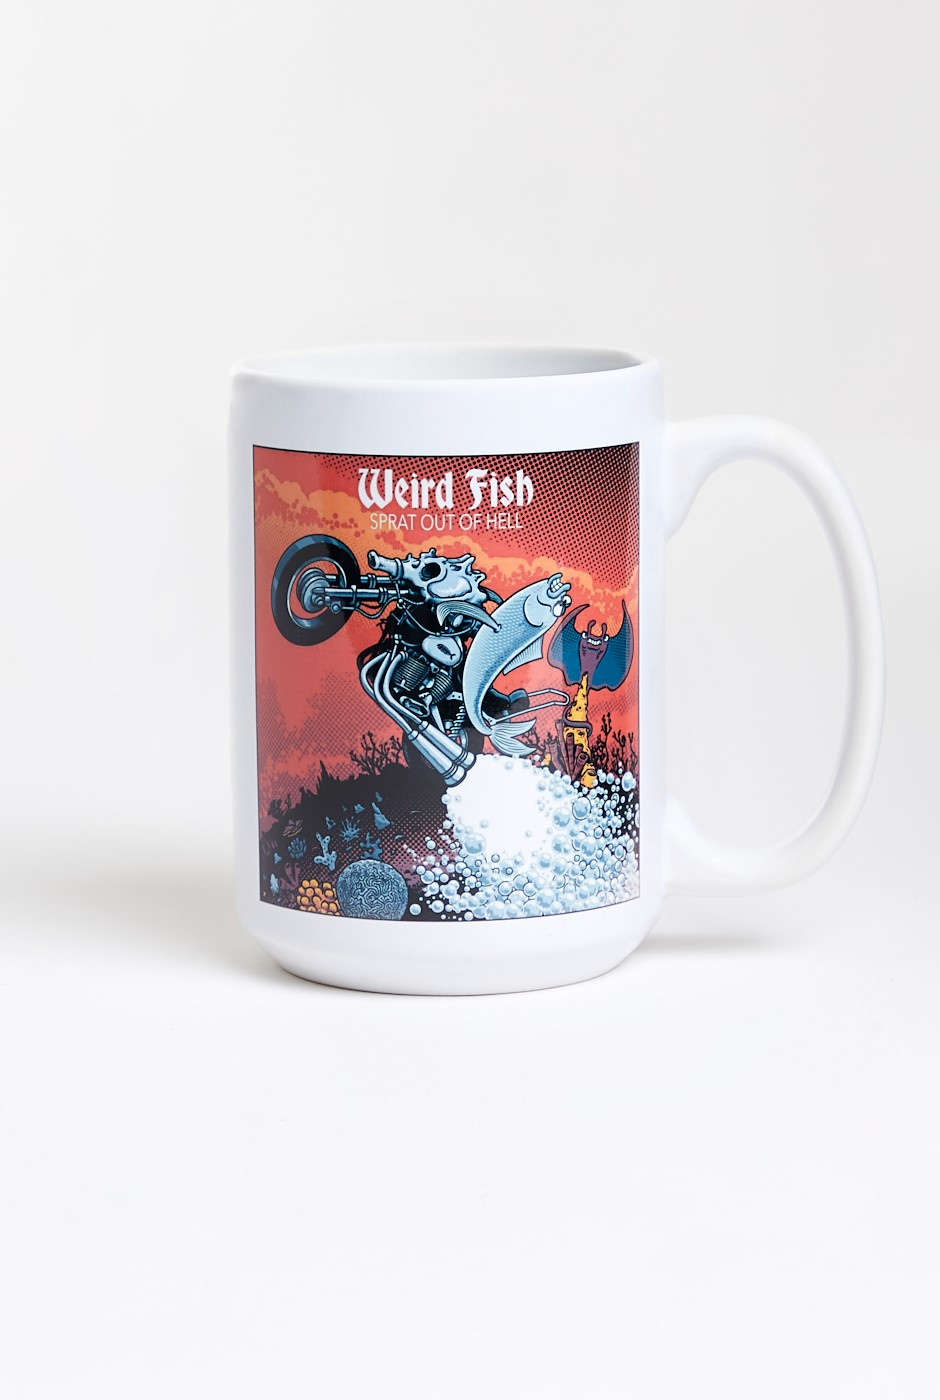 Sprat Out Artist Tee Mug